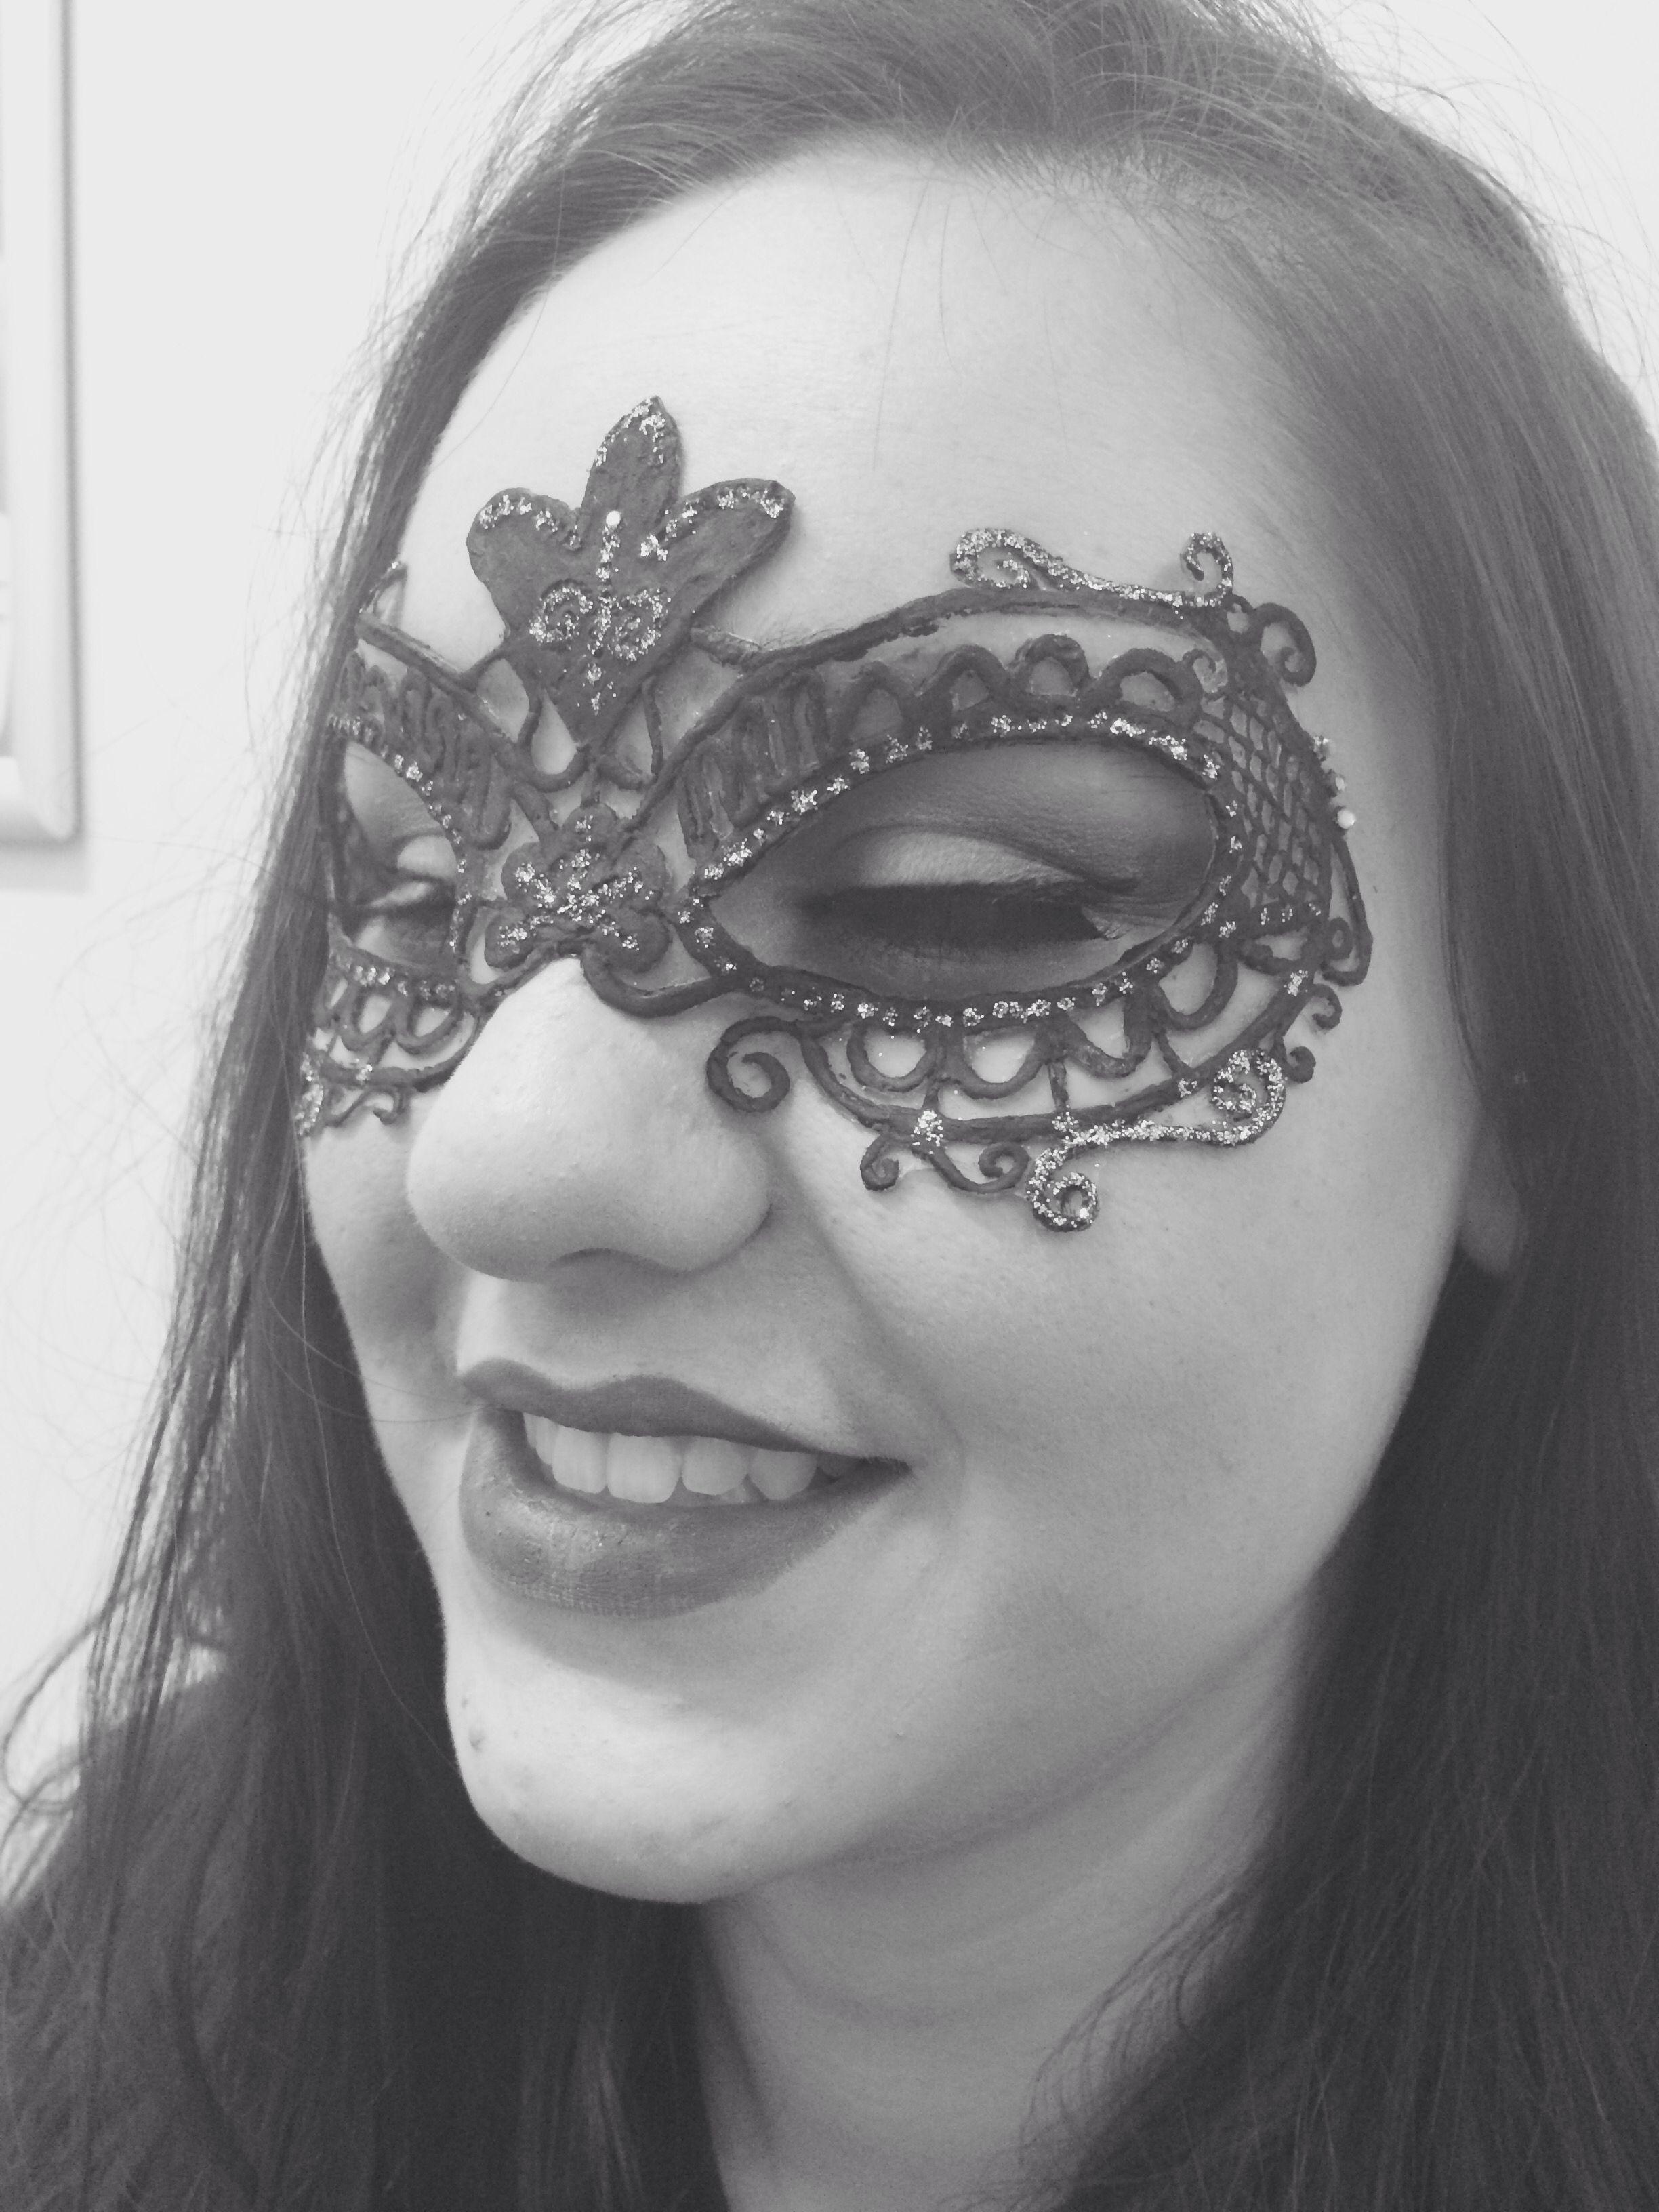 Masquerade mask prosthetic - beauty makeup. MODEL Lauren Hall. MUA-Frances Luck